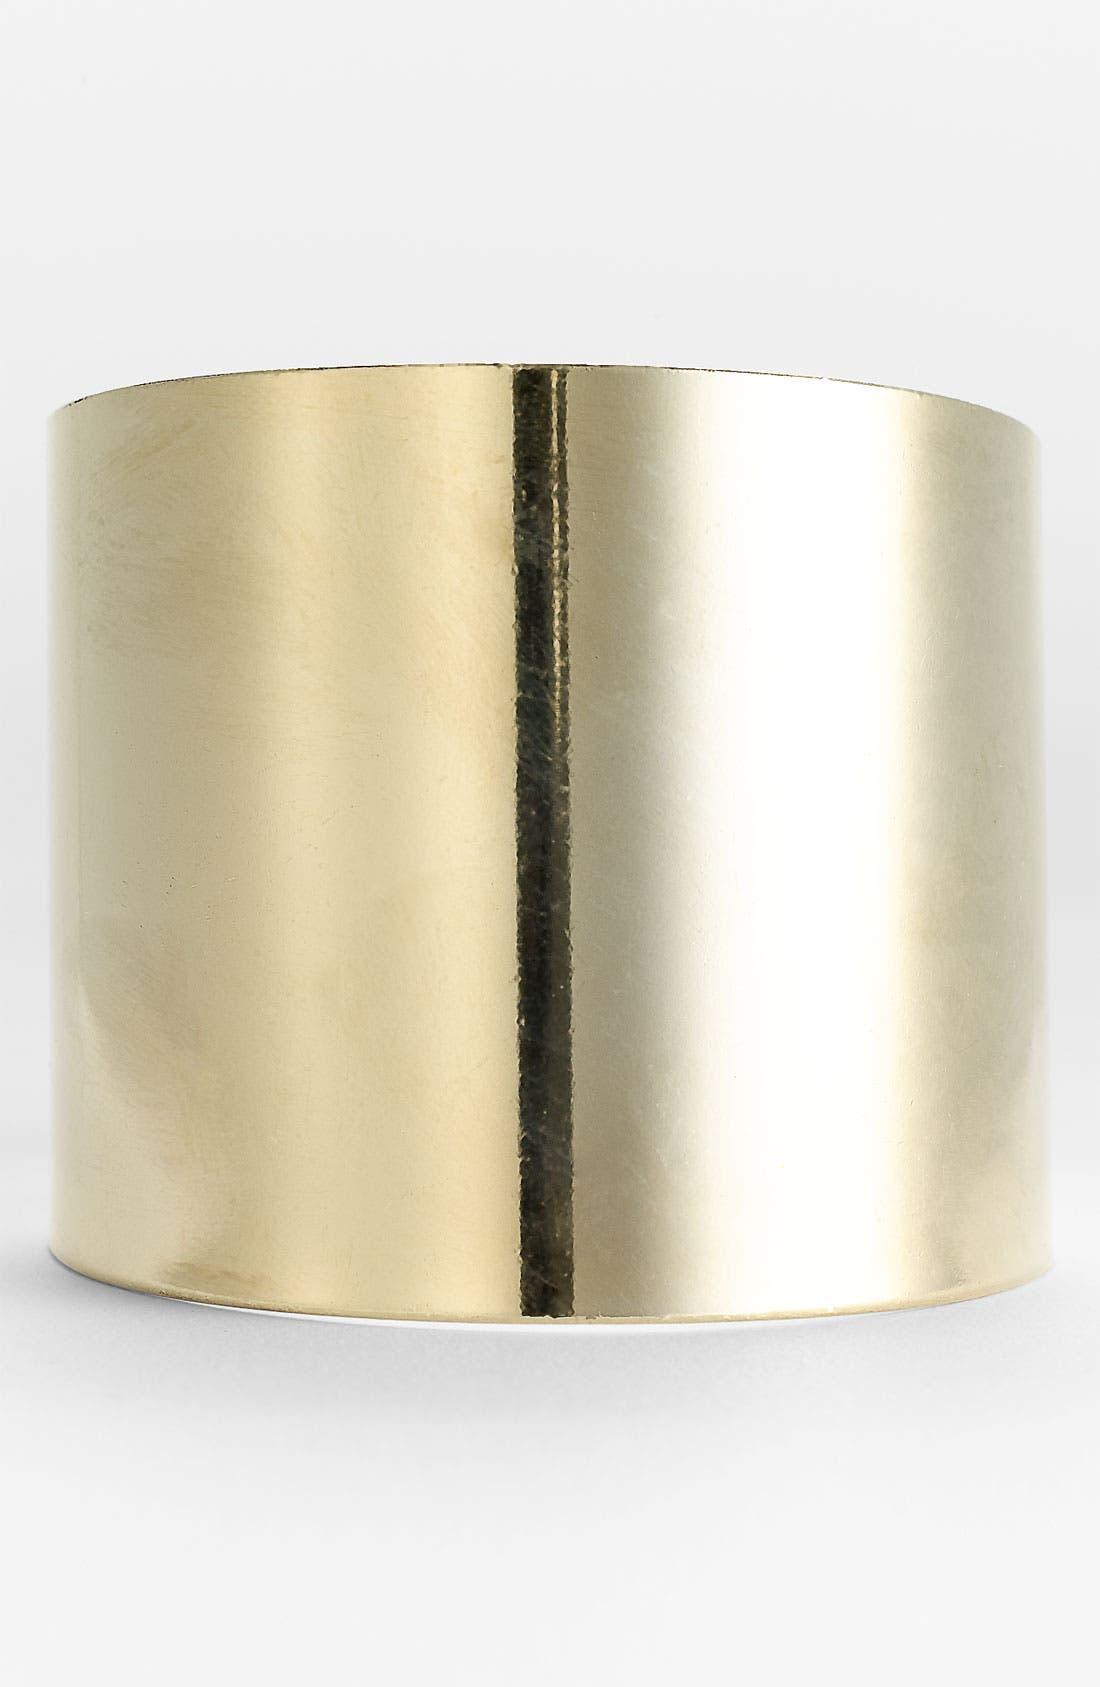 Alternate Image 1 Selected - Carole Minimalist Metal Cuff